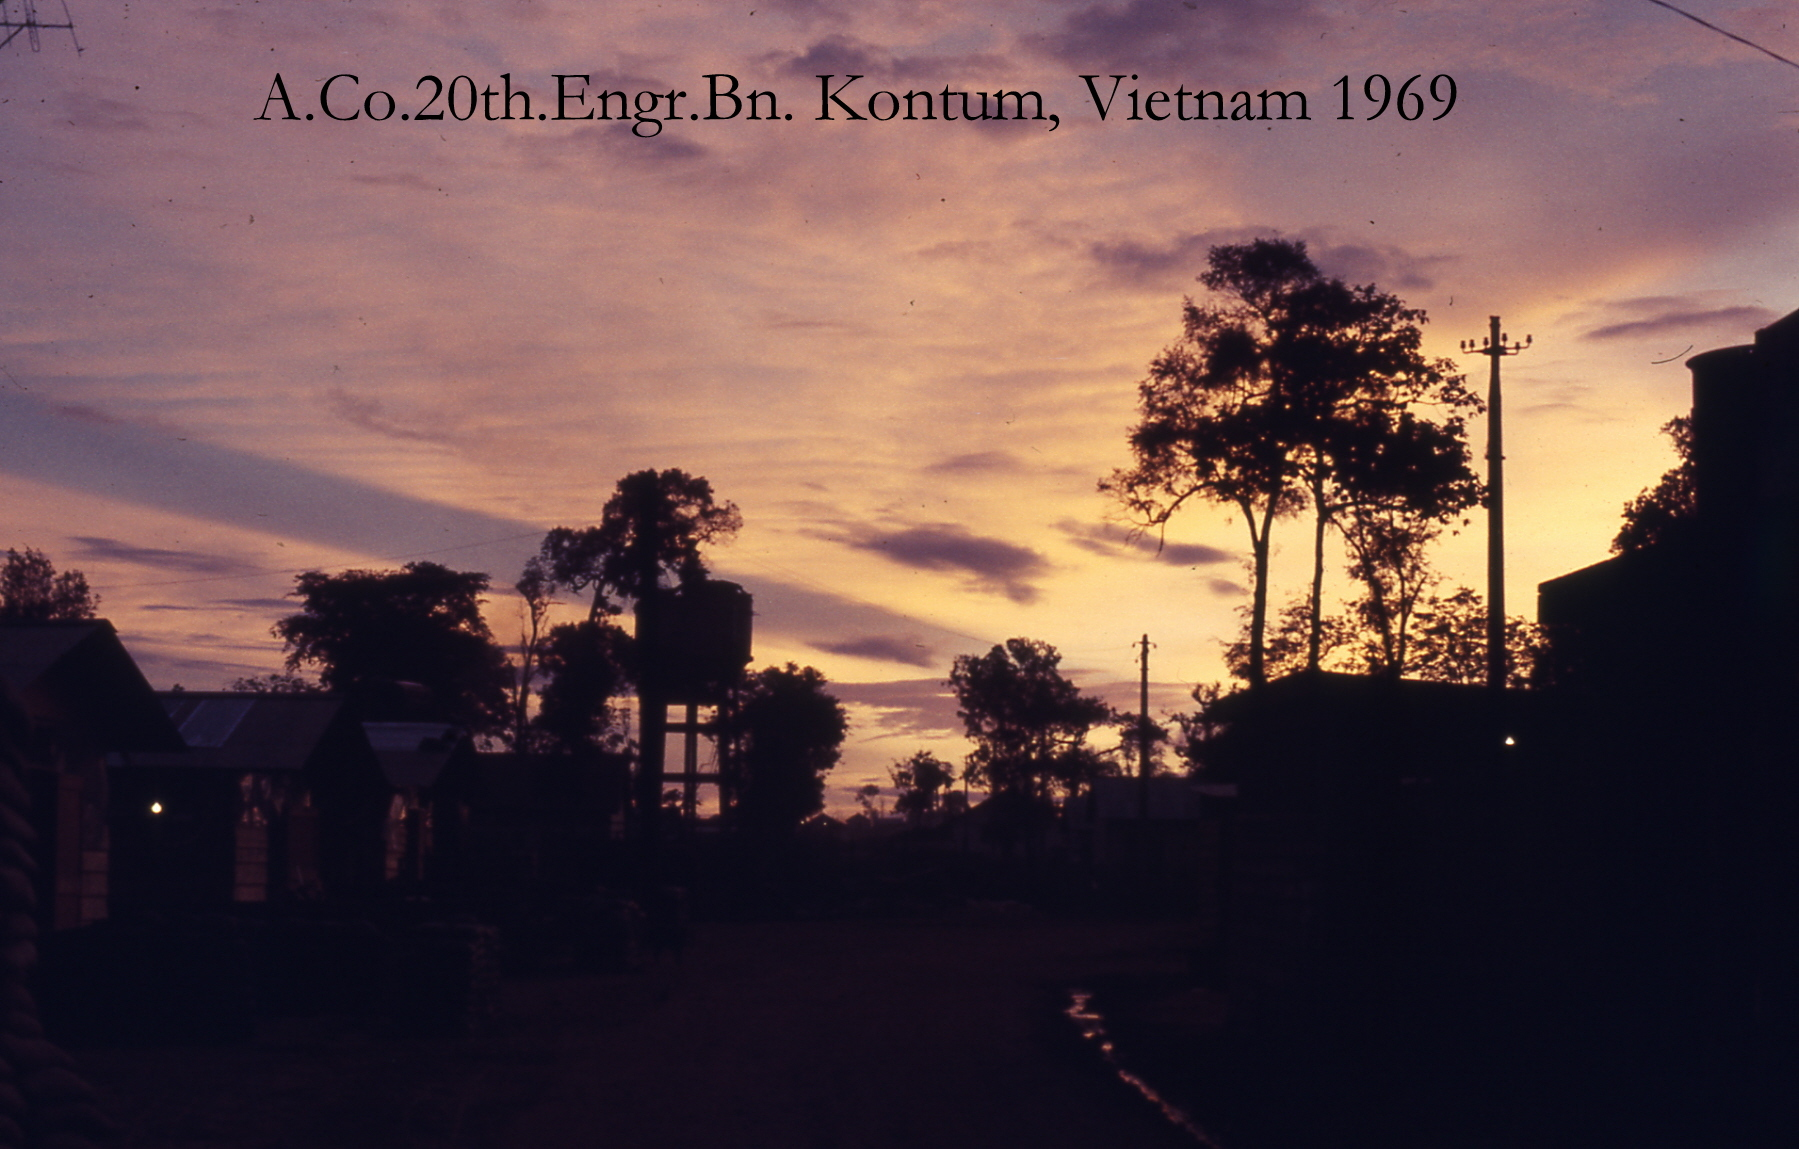 Vietnam War Computer Wallpapers Desktop Backgrounds 1799x1149 ID 1799x1149